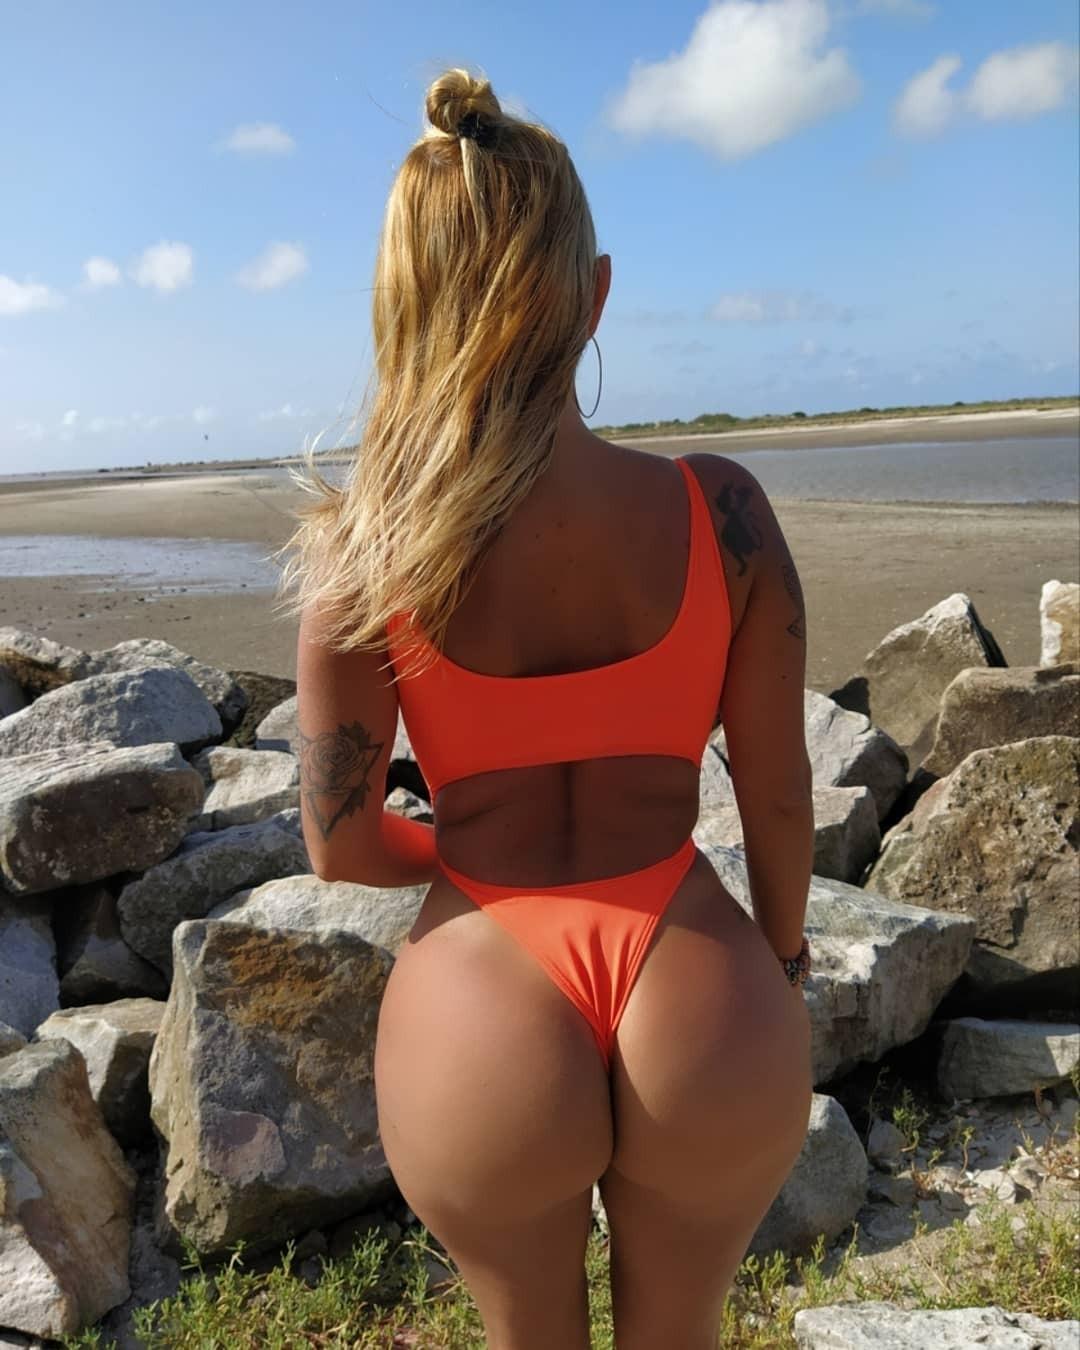 fotos xxx, Samantha R Campos, famosas desnudas, onlyfans, culos ricos, culitos, tanga